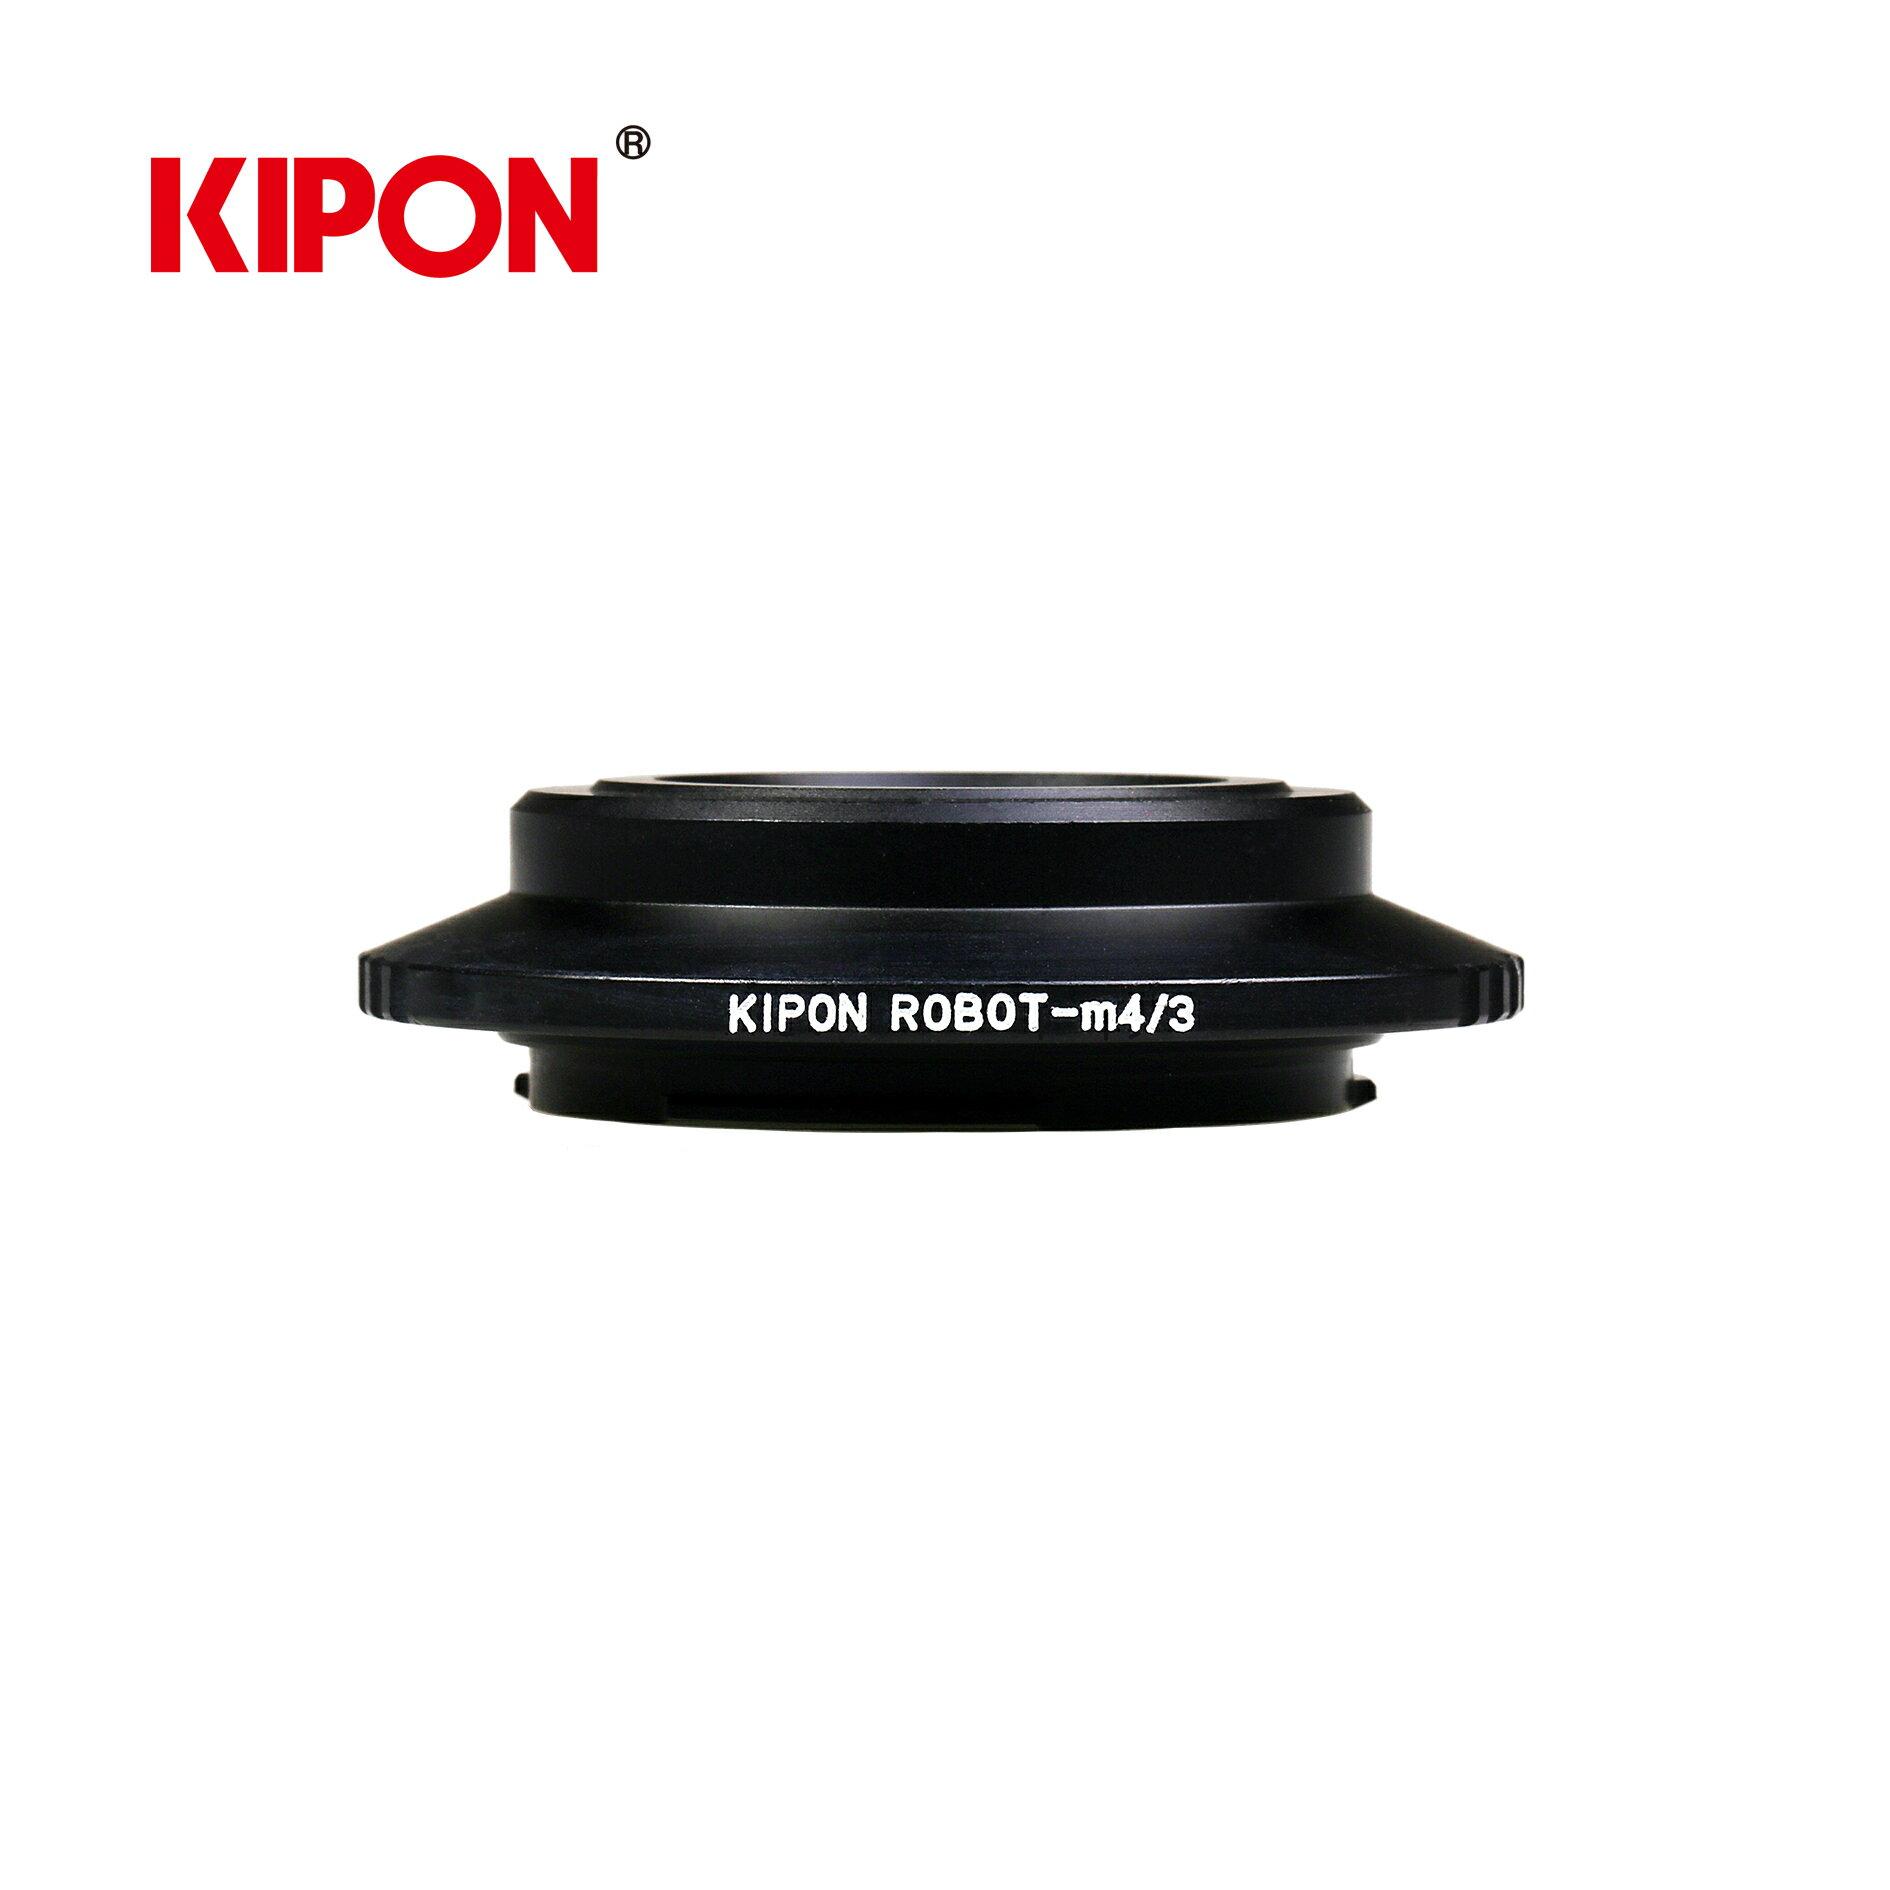 kipon ROBOT-m4/3 (for Panasonic GX7/GX1/G10/GF6/GF5/GF3/GF2/GM1)